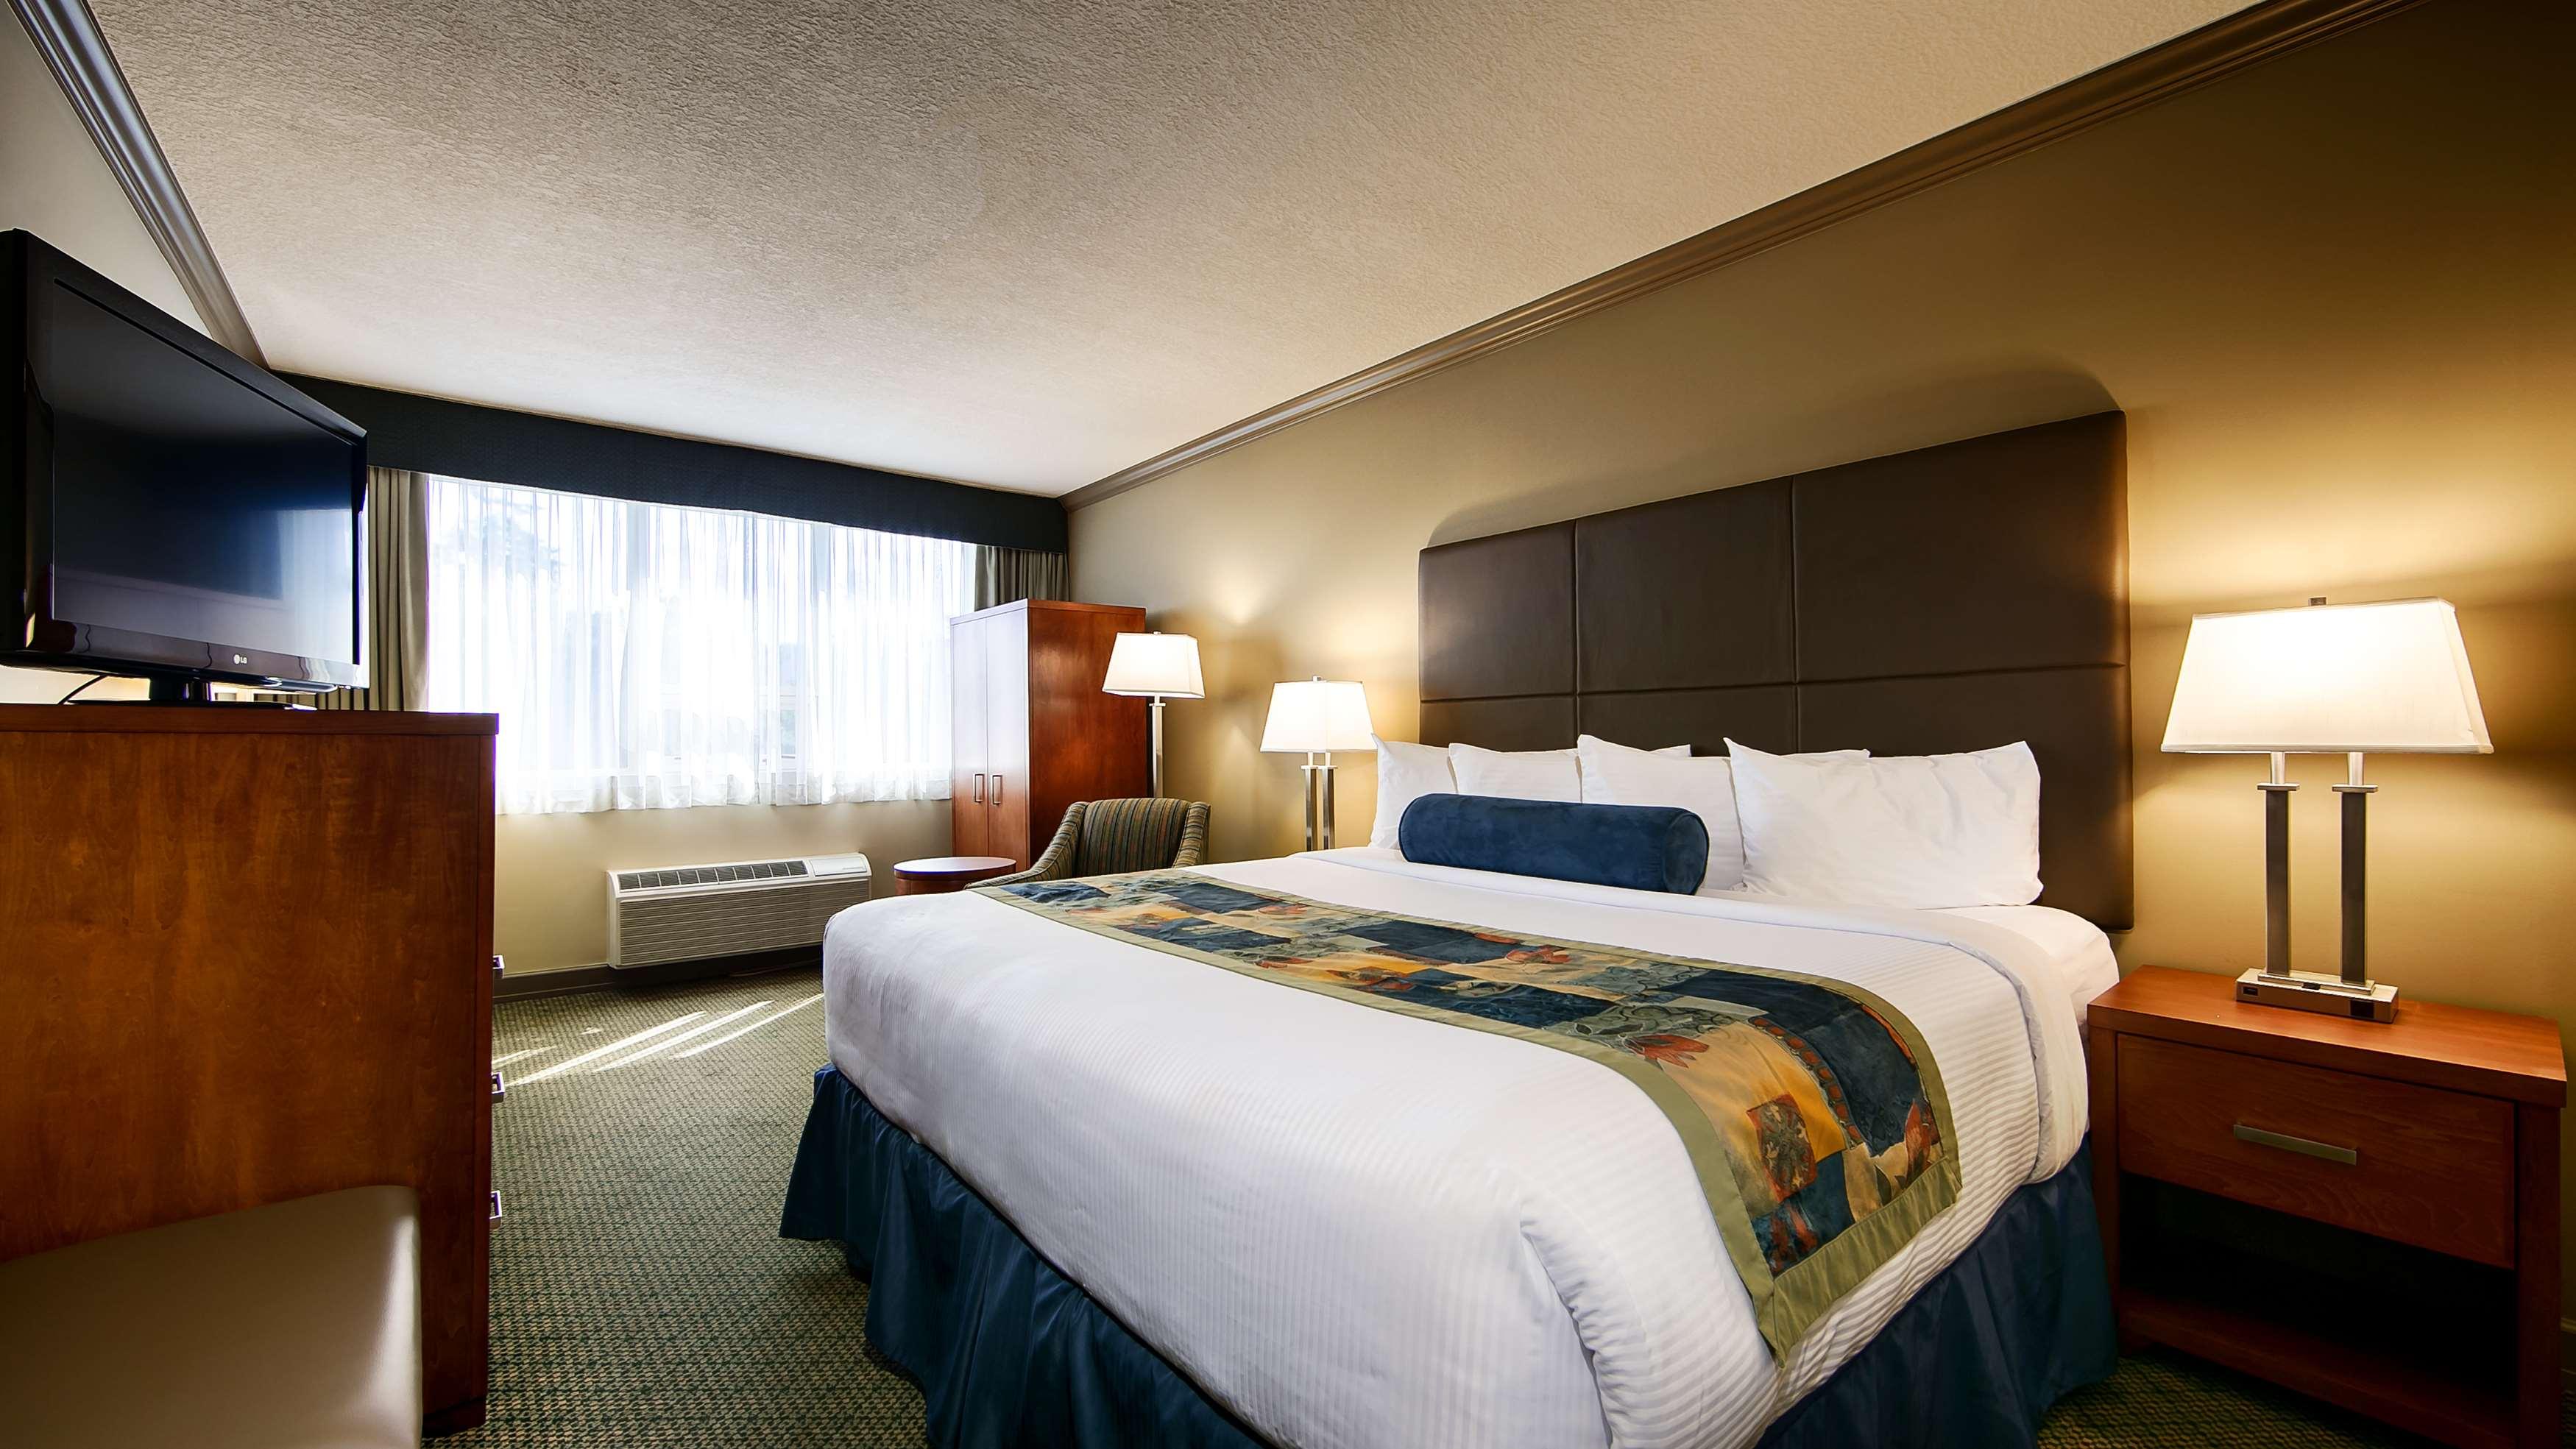 Best Western Plus Barclay Hotel in Port Alberni: King Guest Room